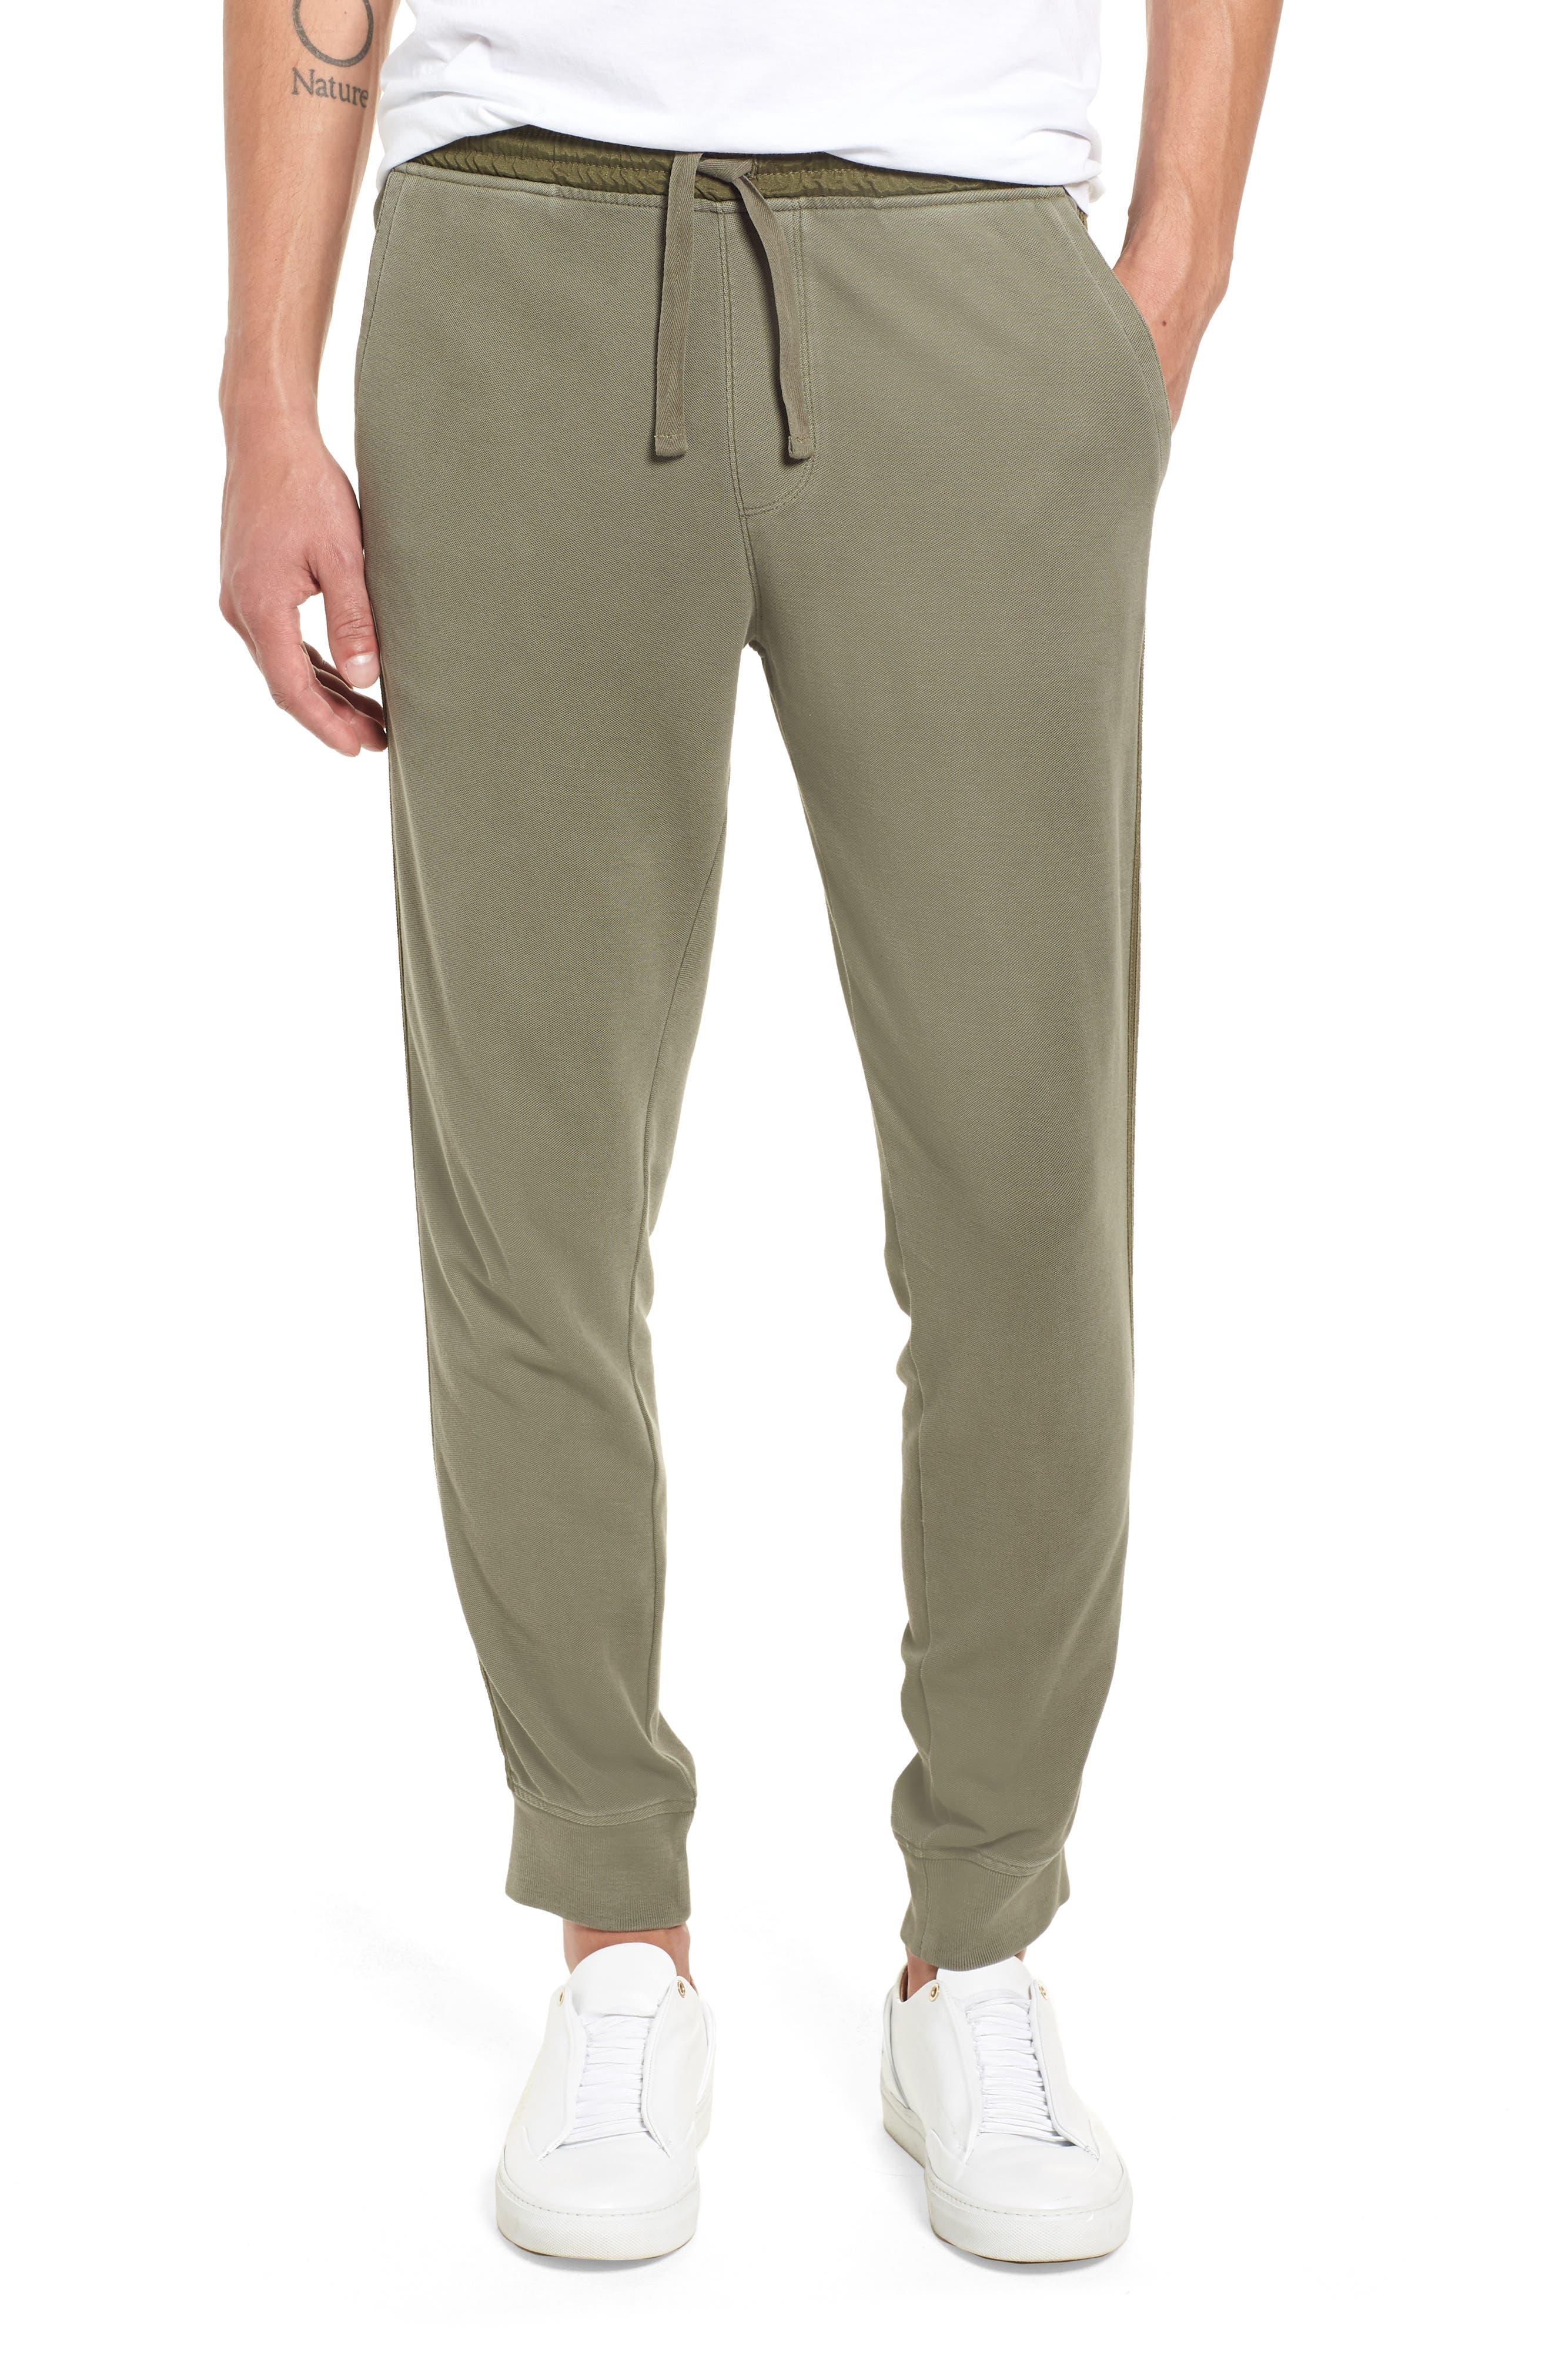 Chroma Wash Regular Fit Piqué Pants,                             Main thumbnail 1, color,                             331